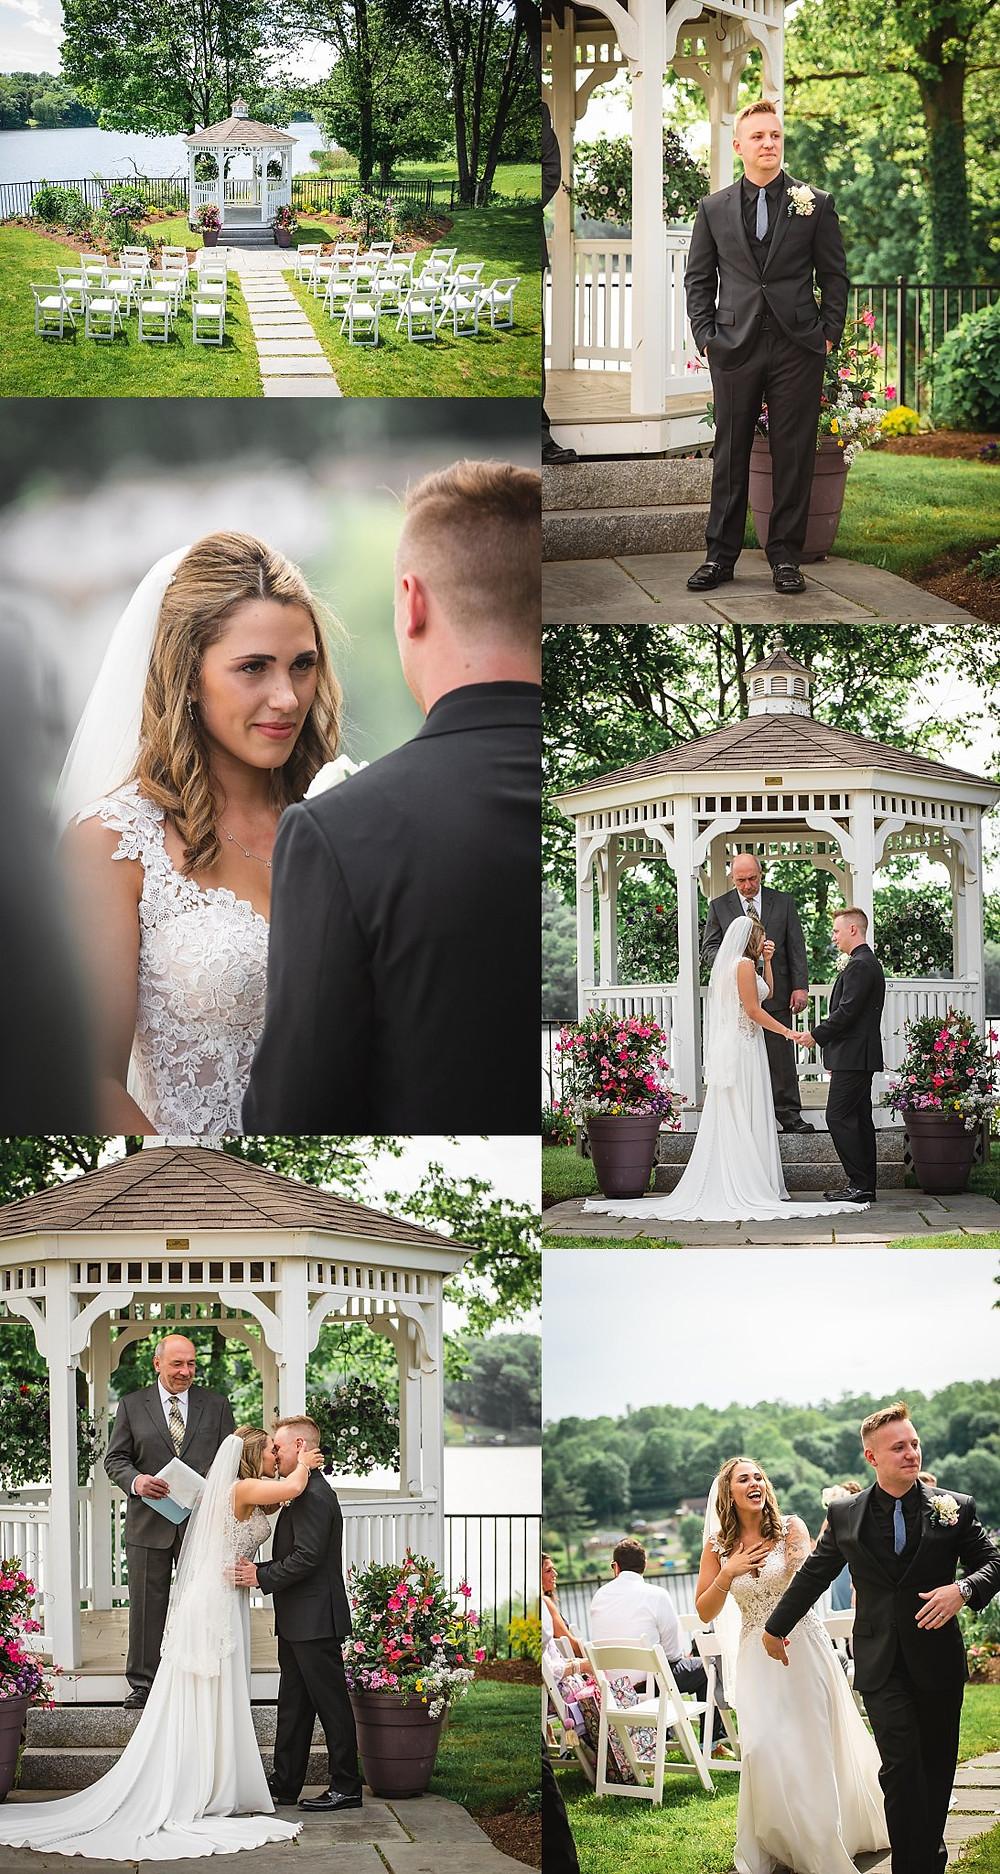 wedding at Anthony's Lake Club in Danbury CT